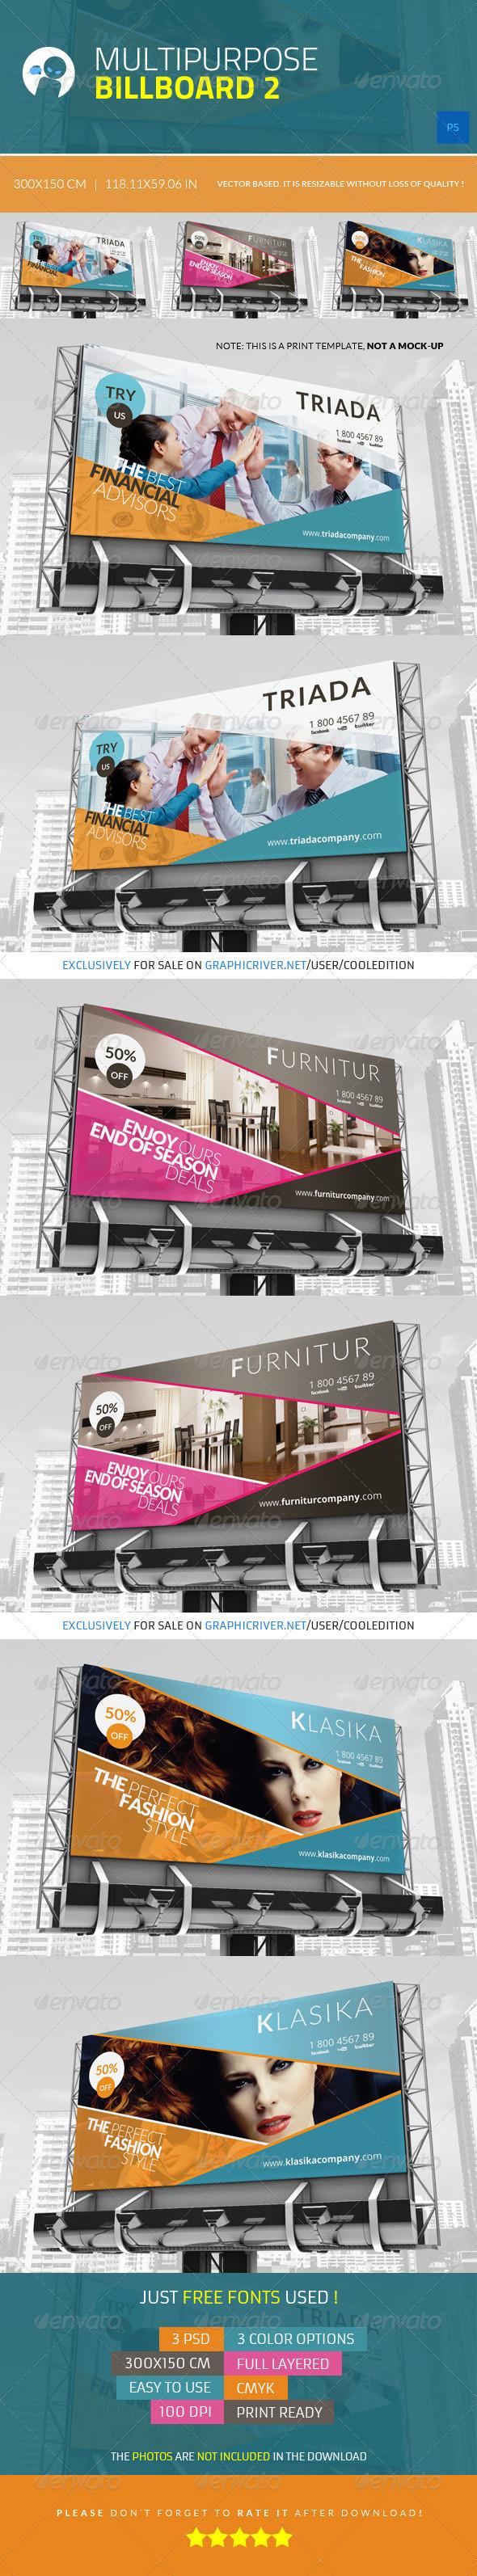 Multipurpose Billboard 2 - Signage Print Templates